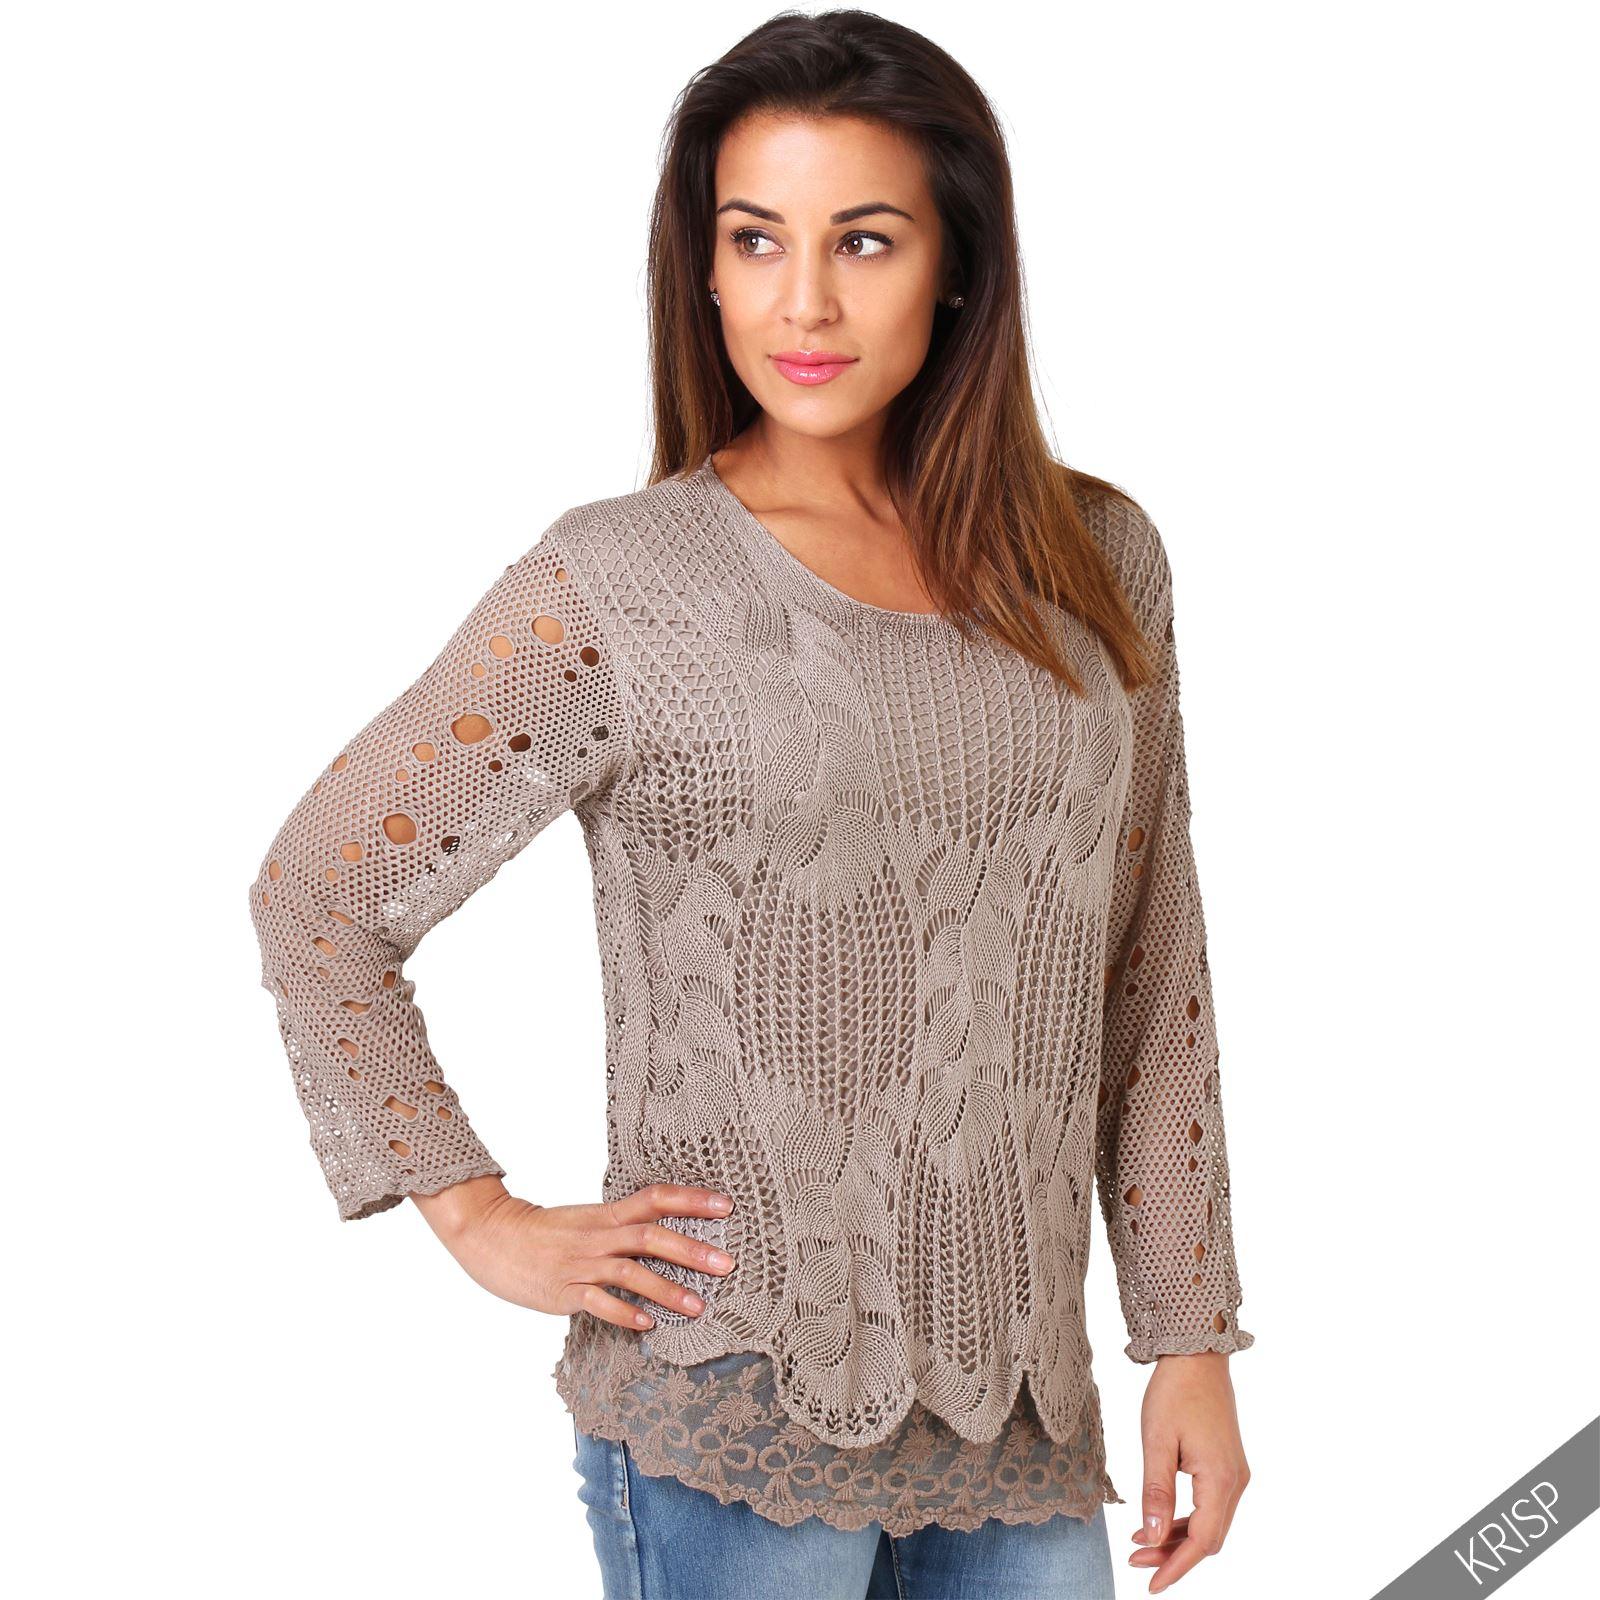 Knitting Summer Blouses : Womens summer retro crochet knit casual jumper frilled